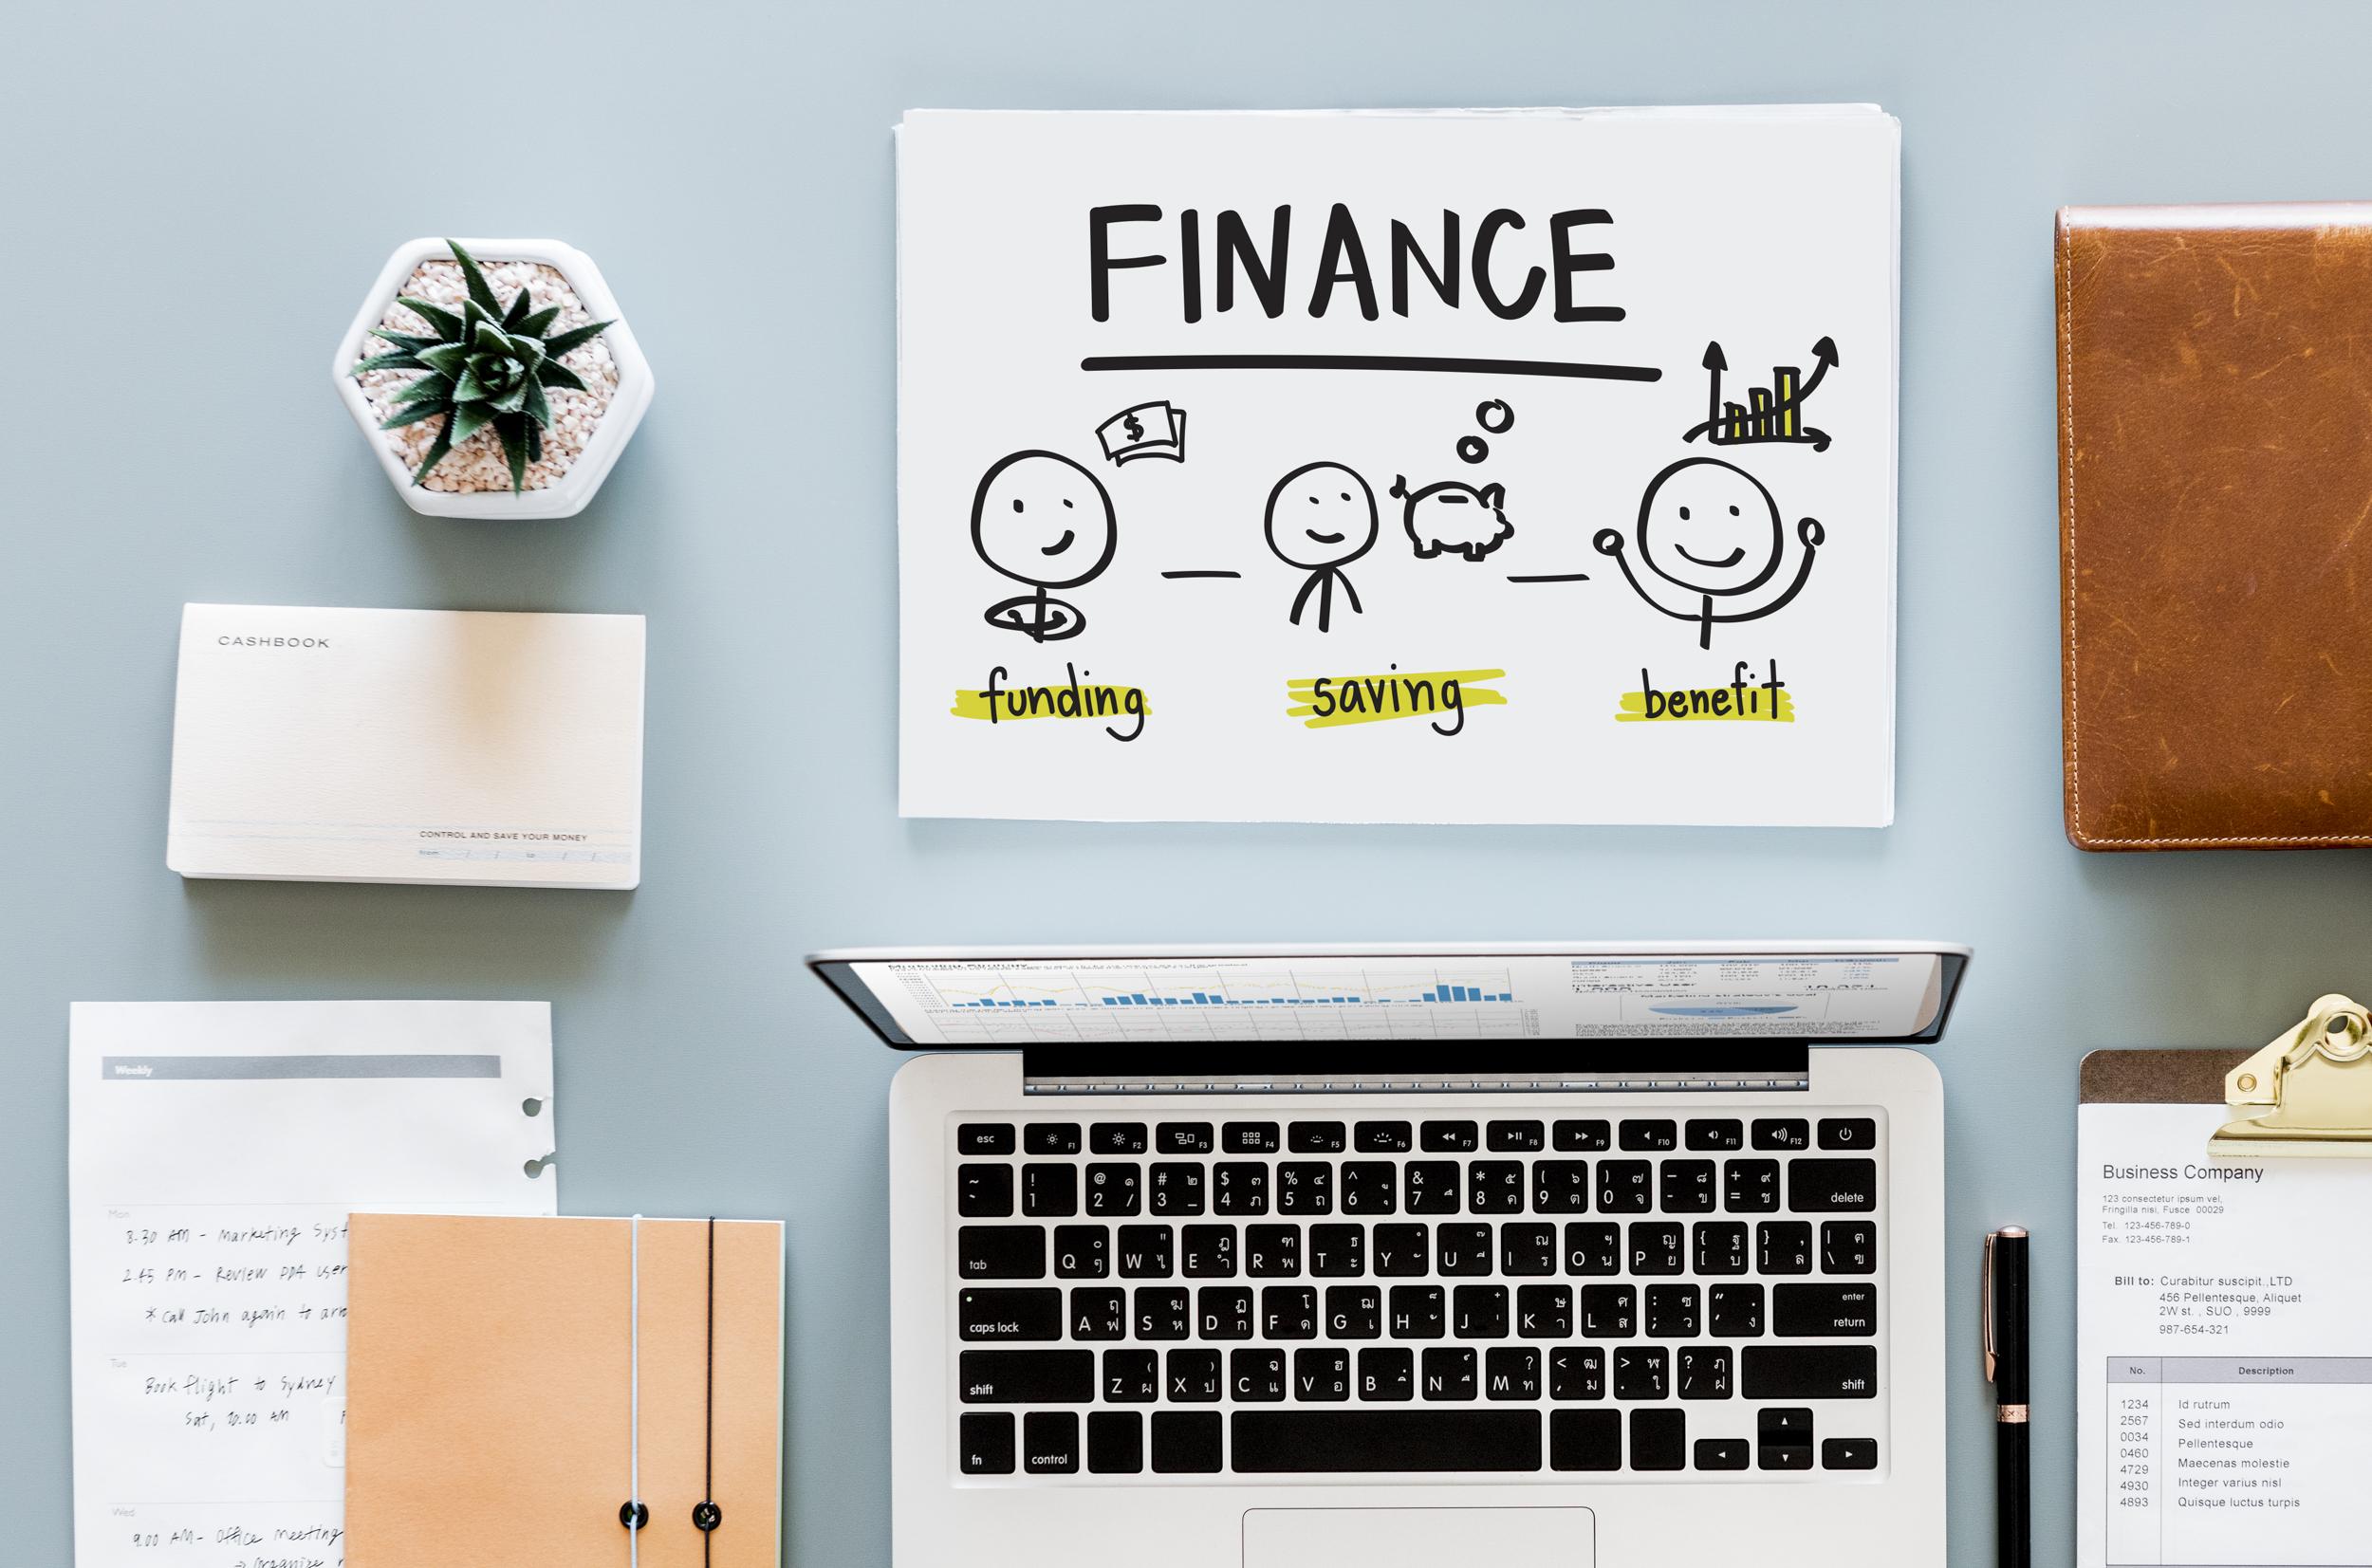 The three steps of finance: funding, savings, benefits.